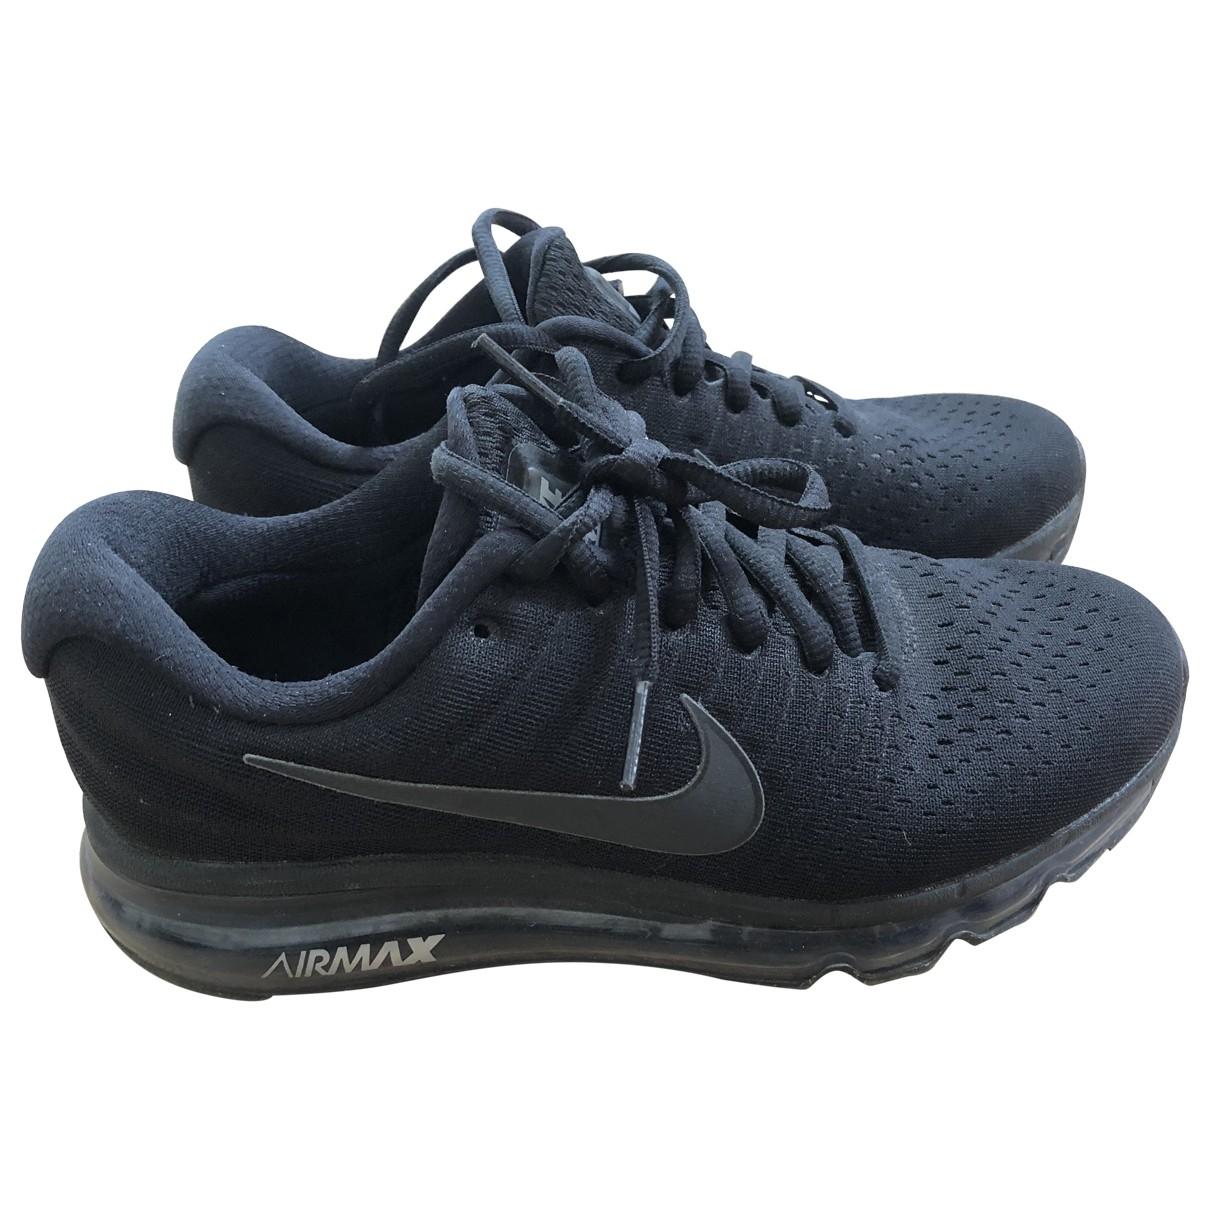 Nike Air Max  Black Trainers for Women 37.5 EU